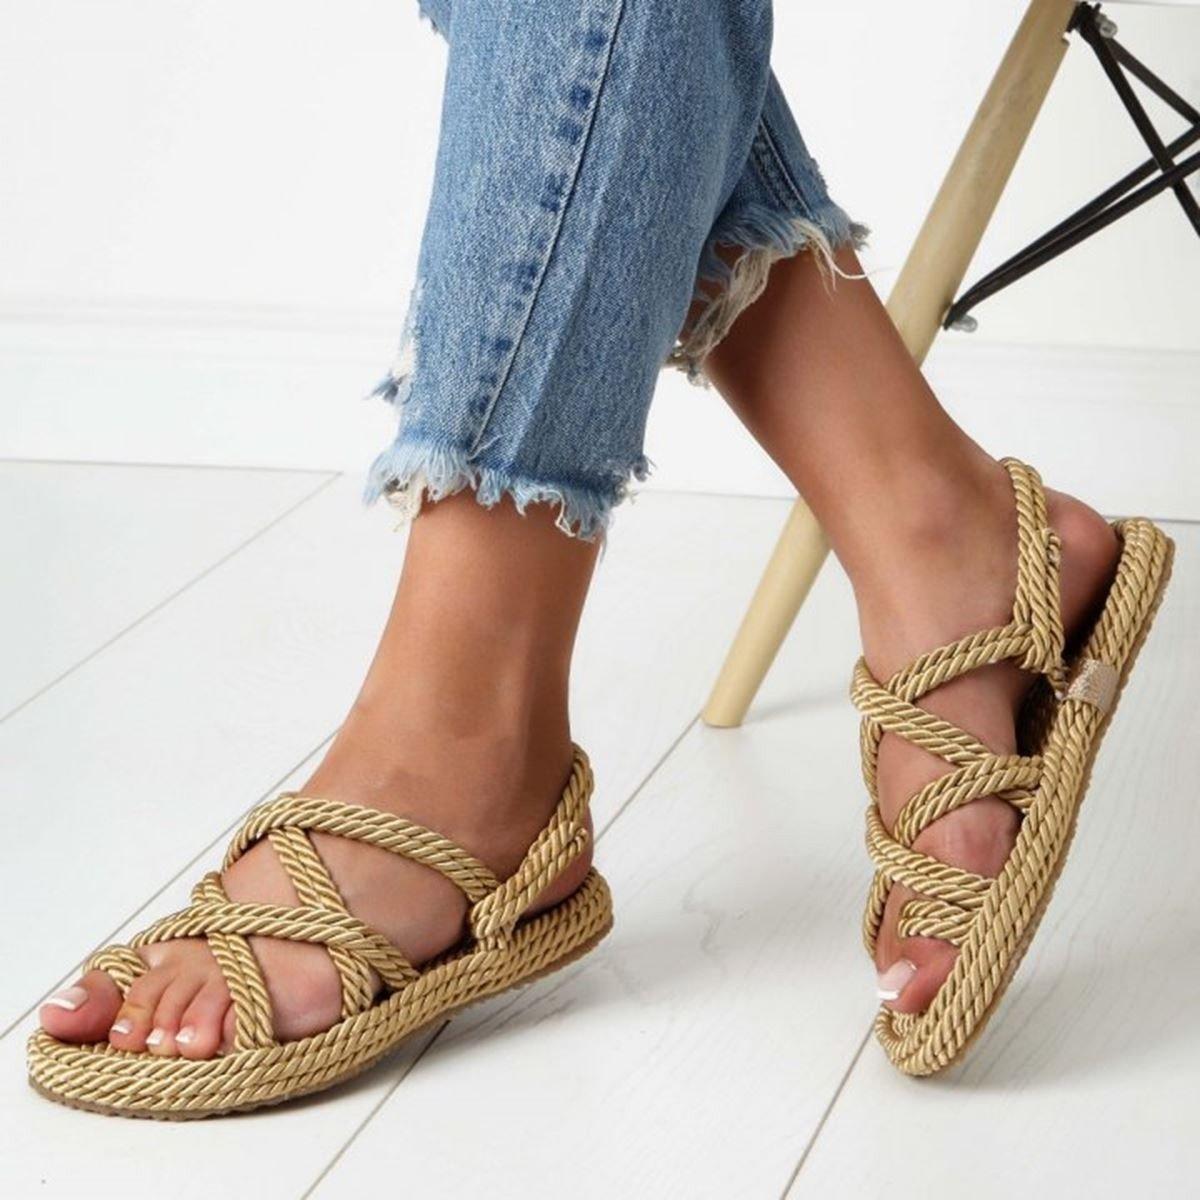 rgü-sandalet-1